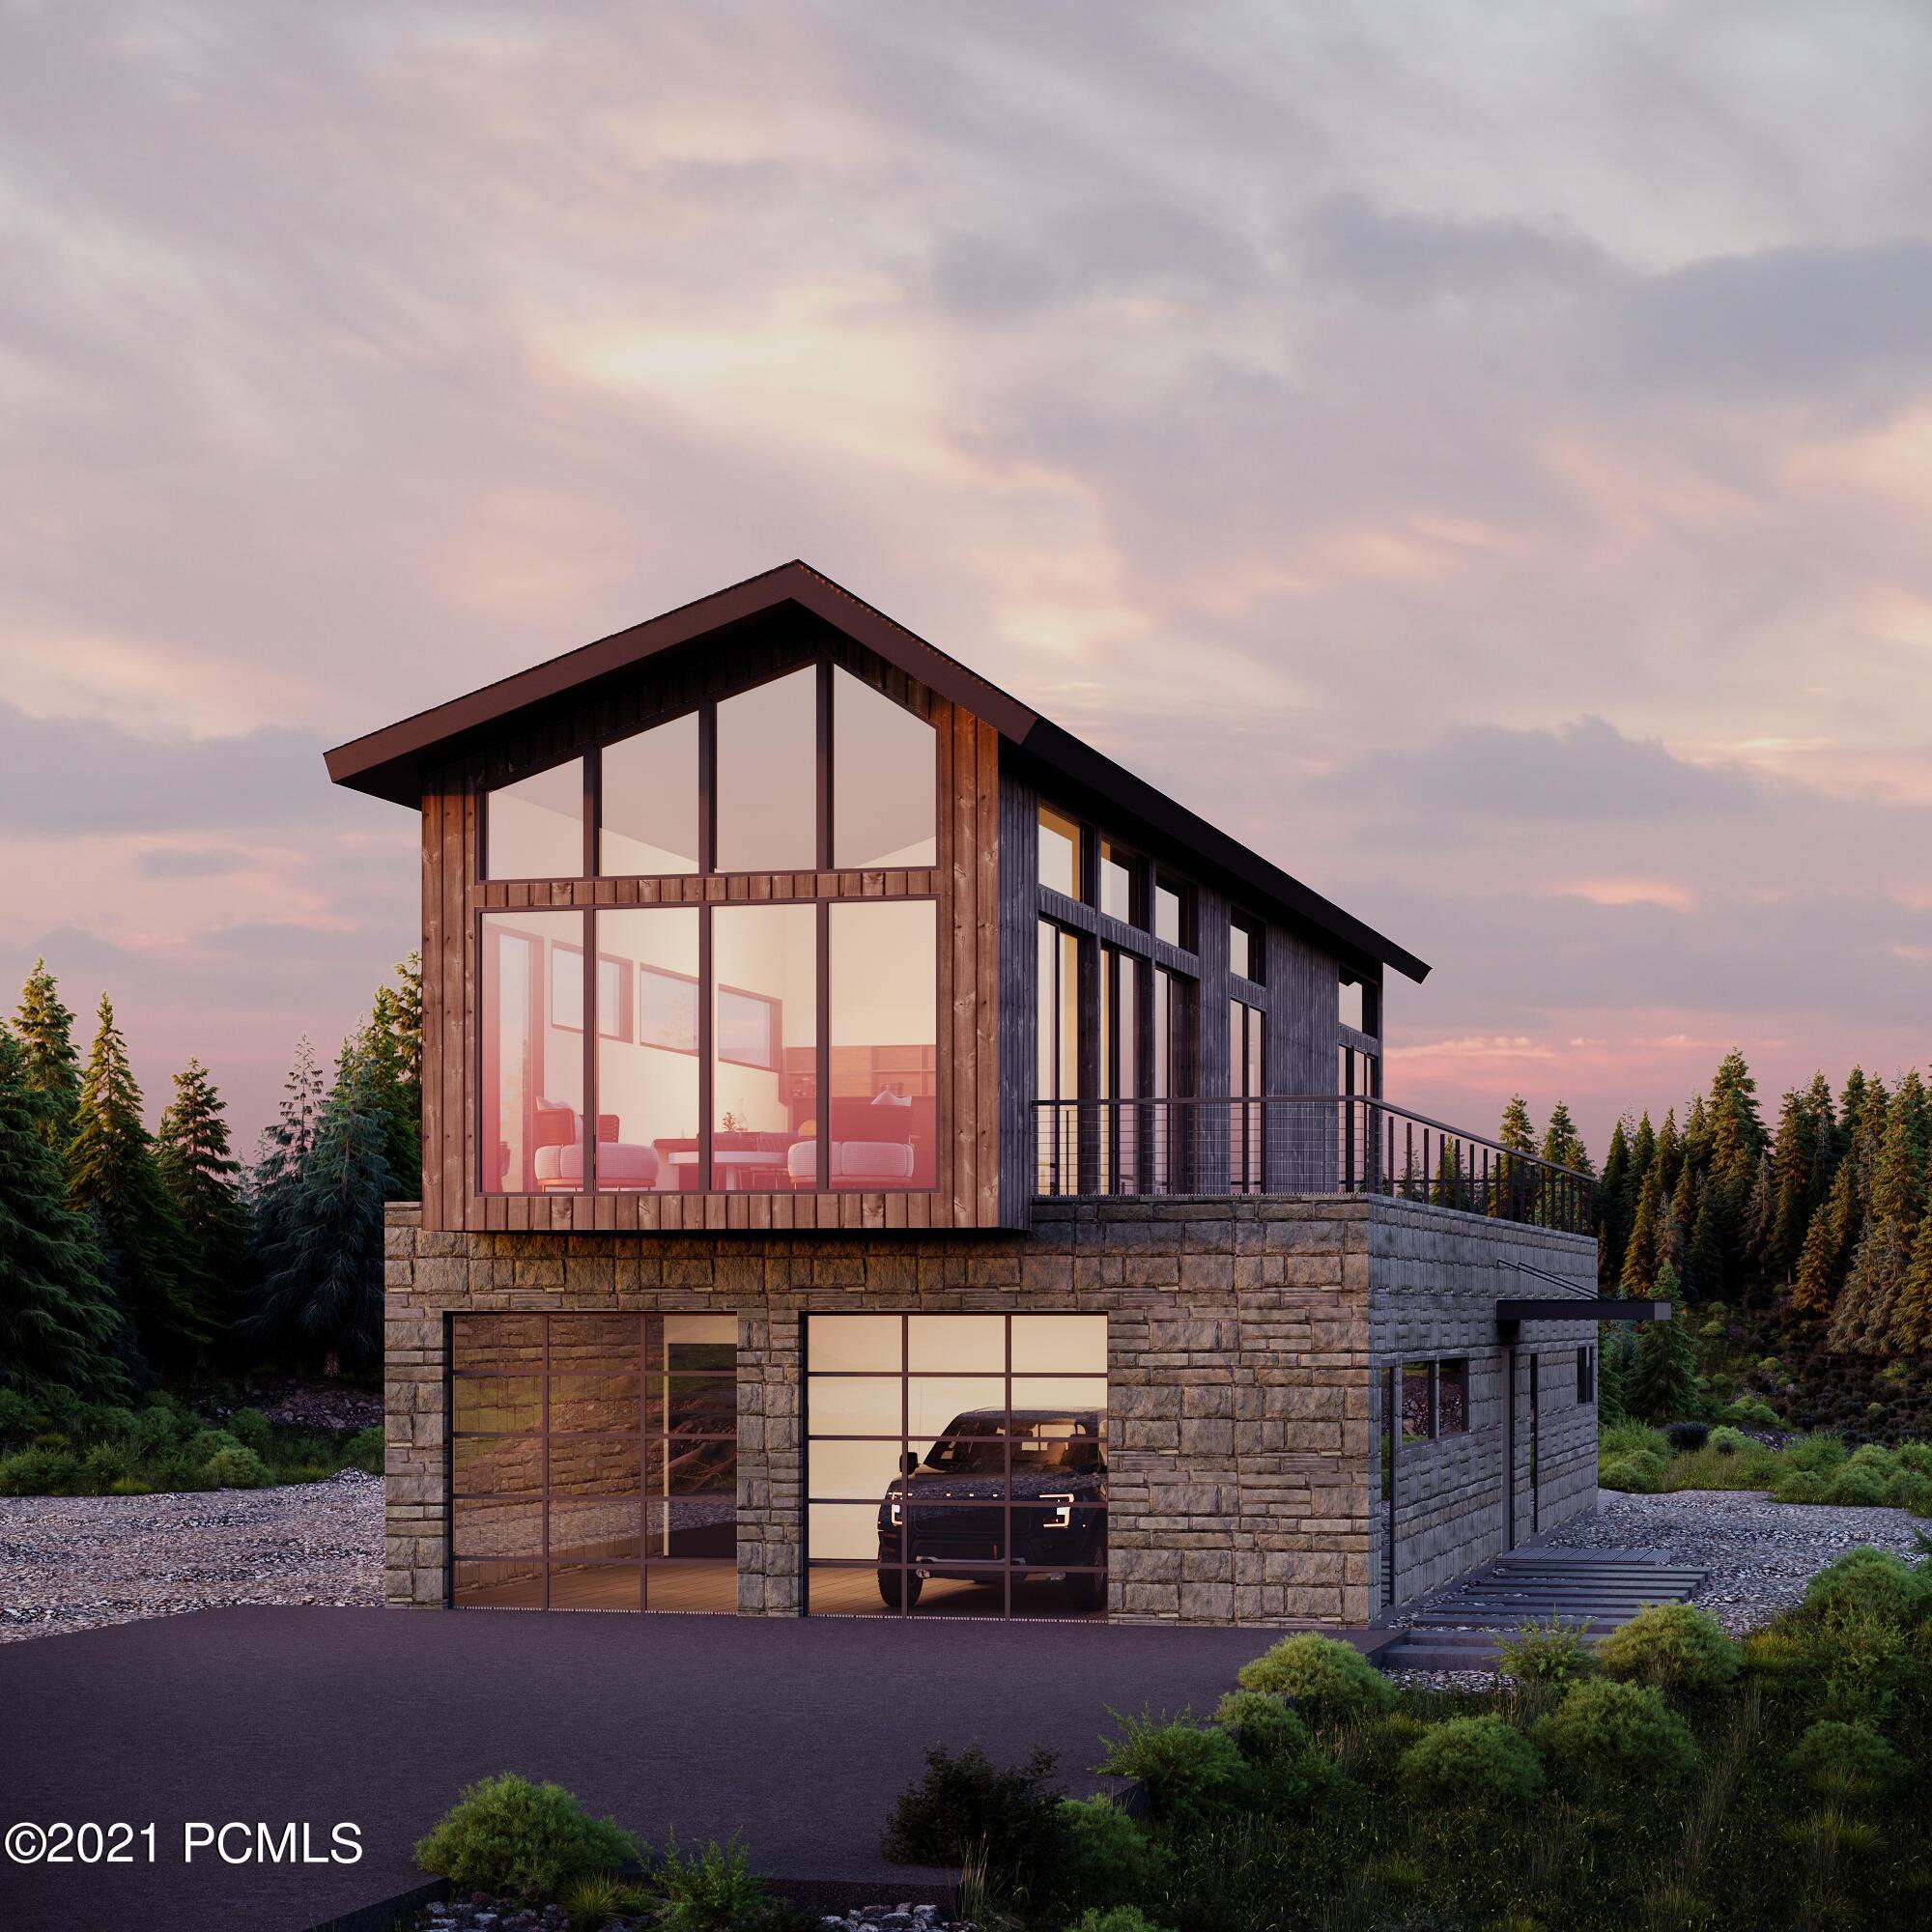 3878 Islay Drive, Heber City, Utah 84032, 4 Bedrooms Bedrooms, ,4 BathroomsBathrooms,Single Family,For Sale,Islay,12104202